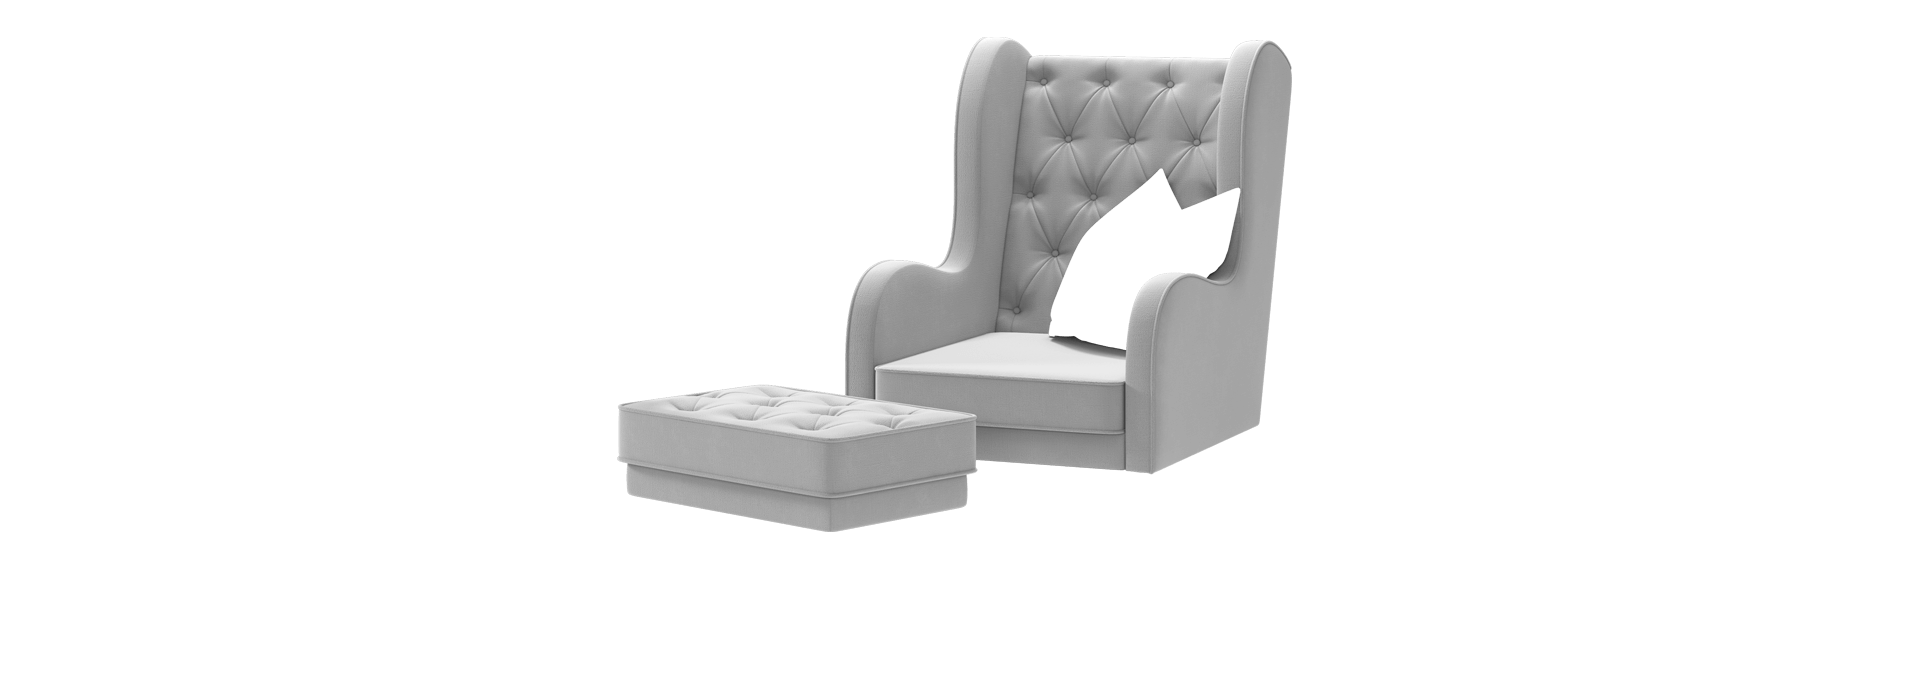 Майа C крісло - маска 3